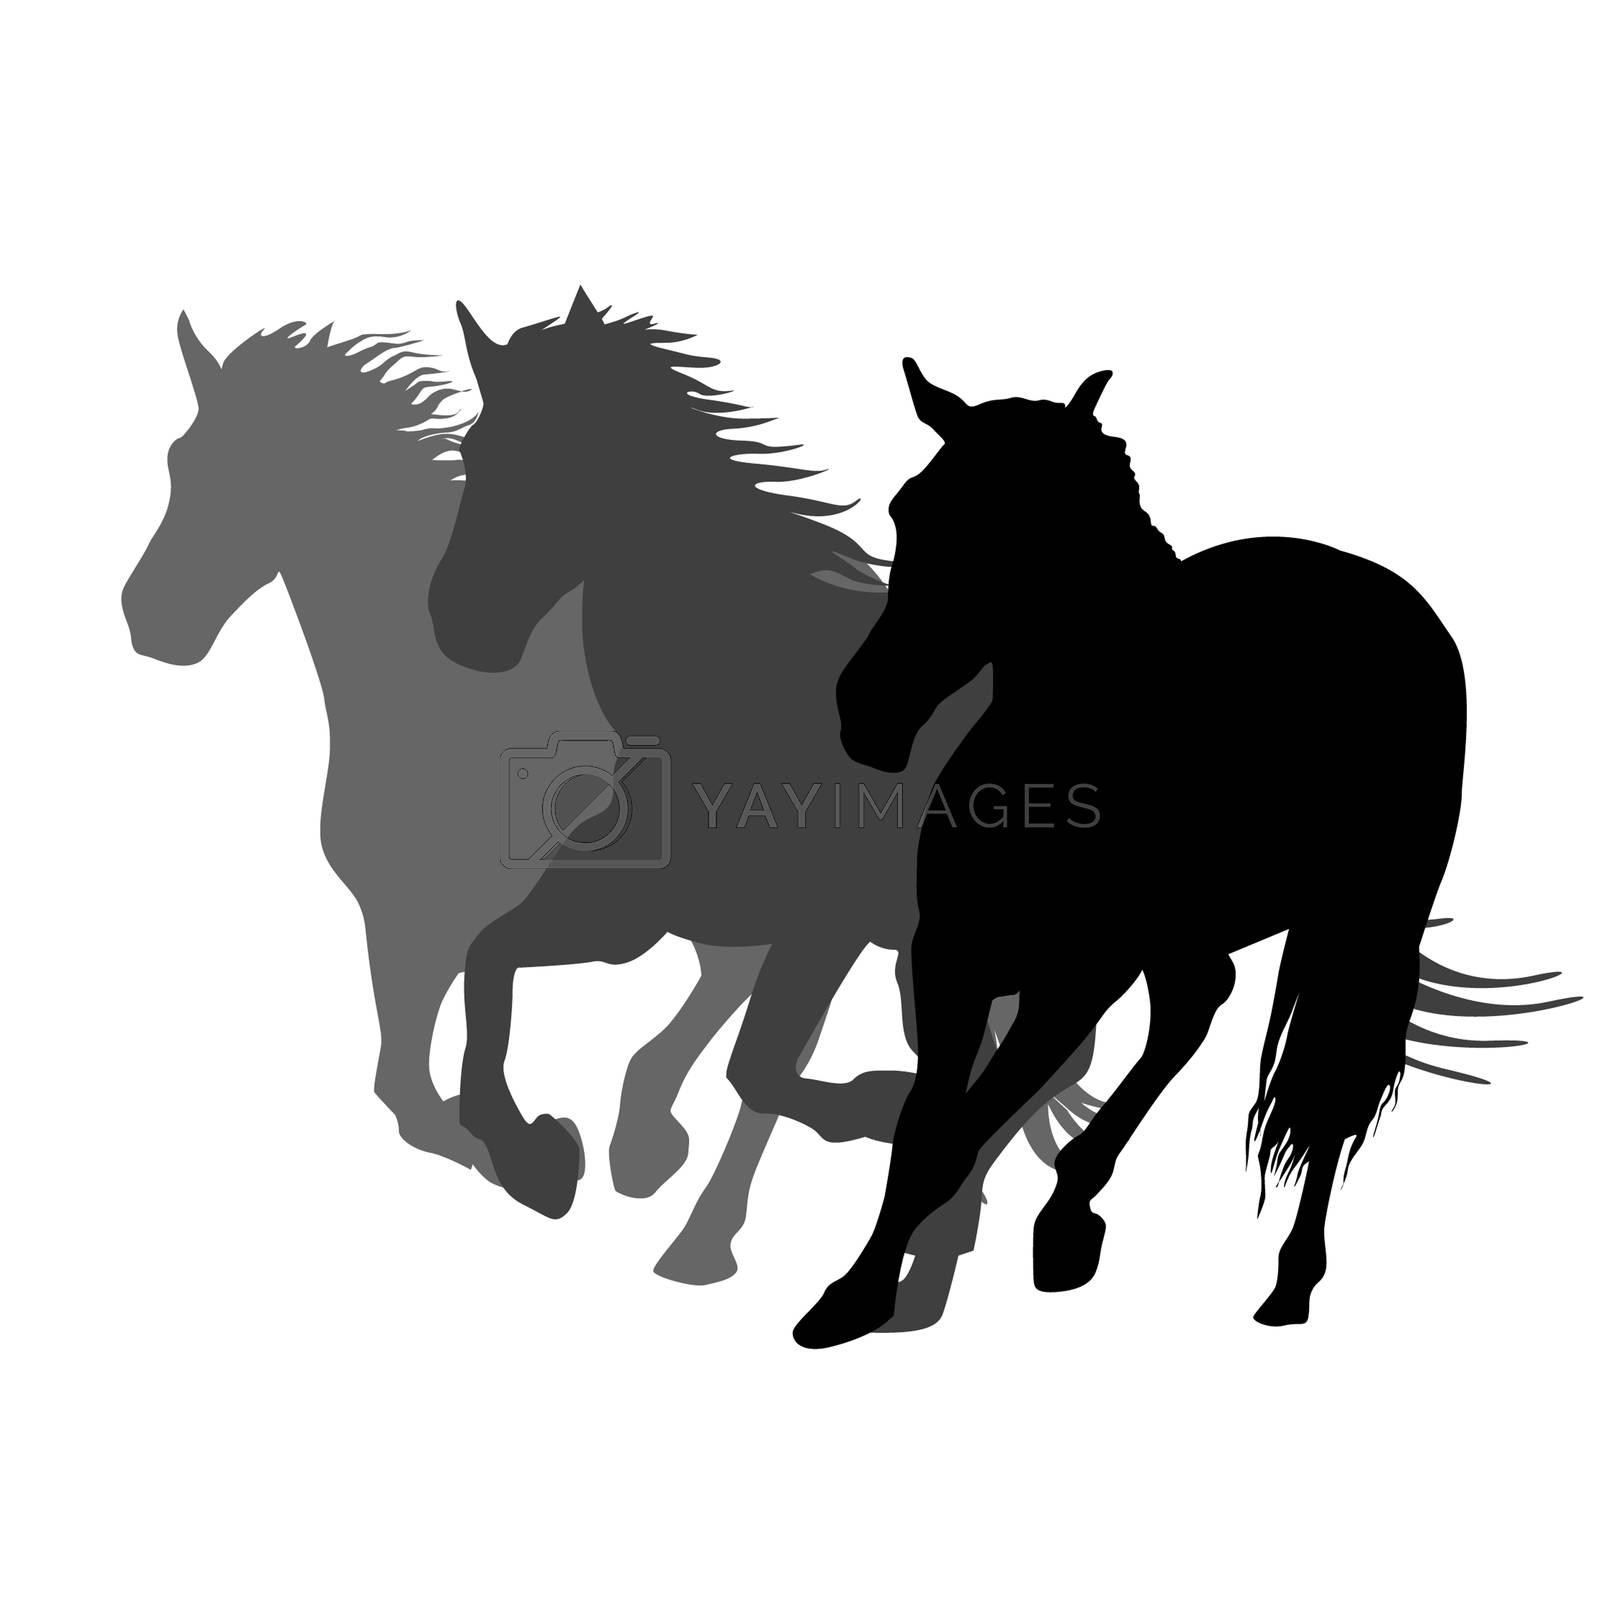 Silhouettes of three horses running